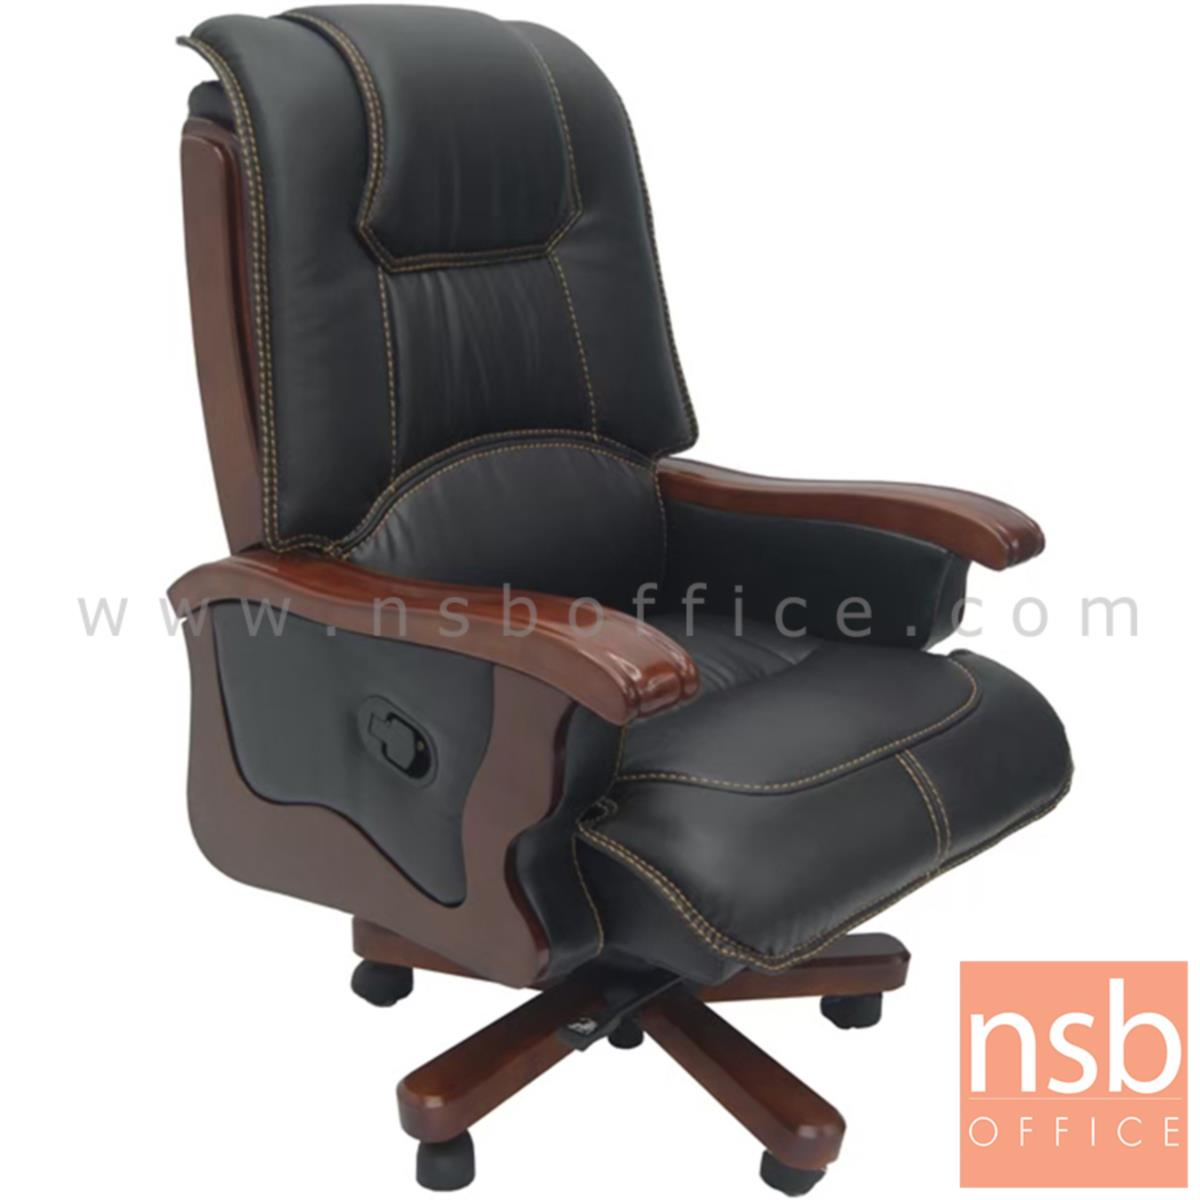 B25A124:เก้าอี้ผู้บริหารหนังเทียม รุ่น Rayshawn (เรย์ชอน)  โช๊คแก๊ส มีก้อนโยก ขาไม้